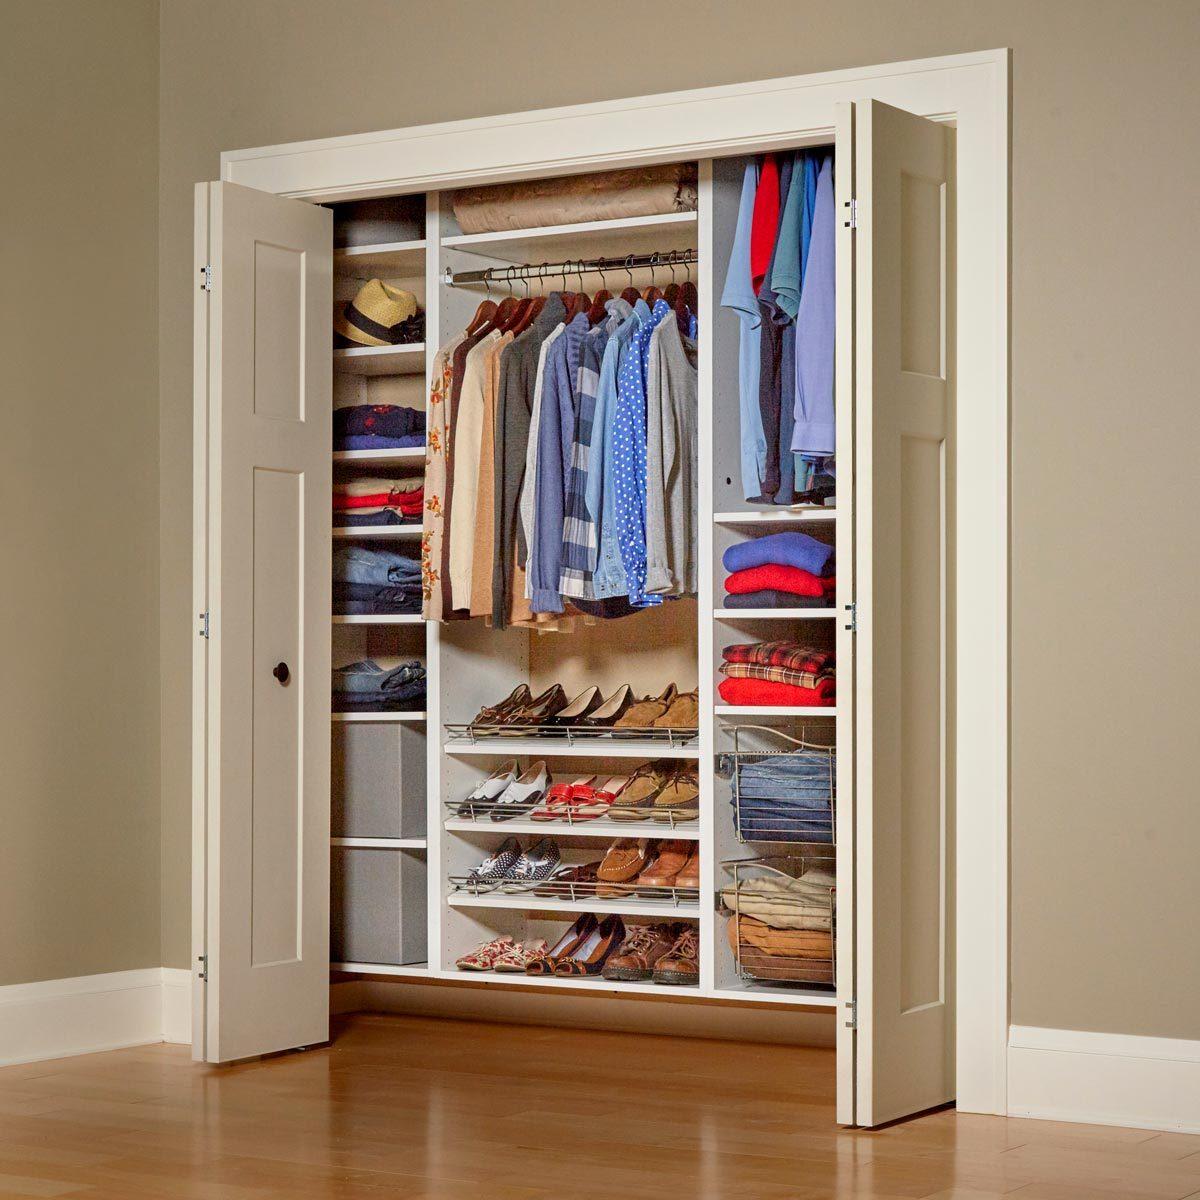 FH16FEB_565_51_048 closet organization